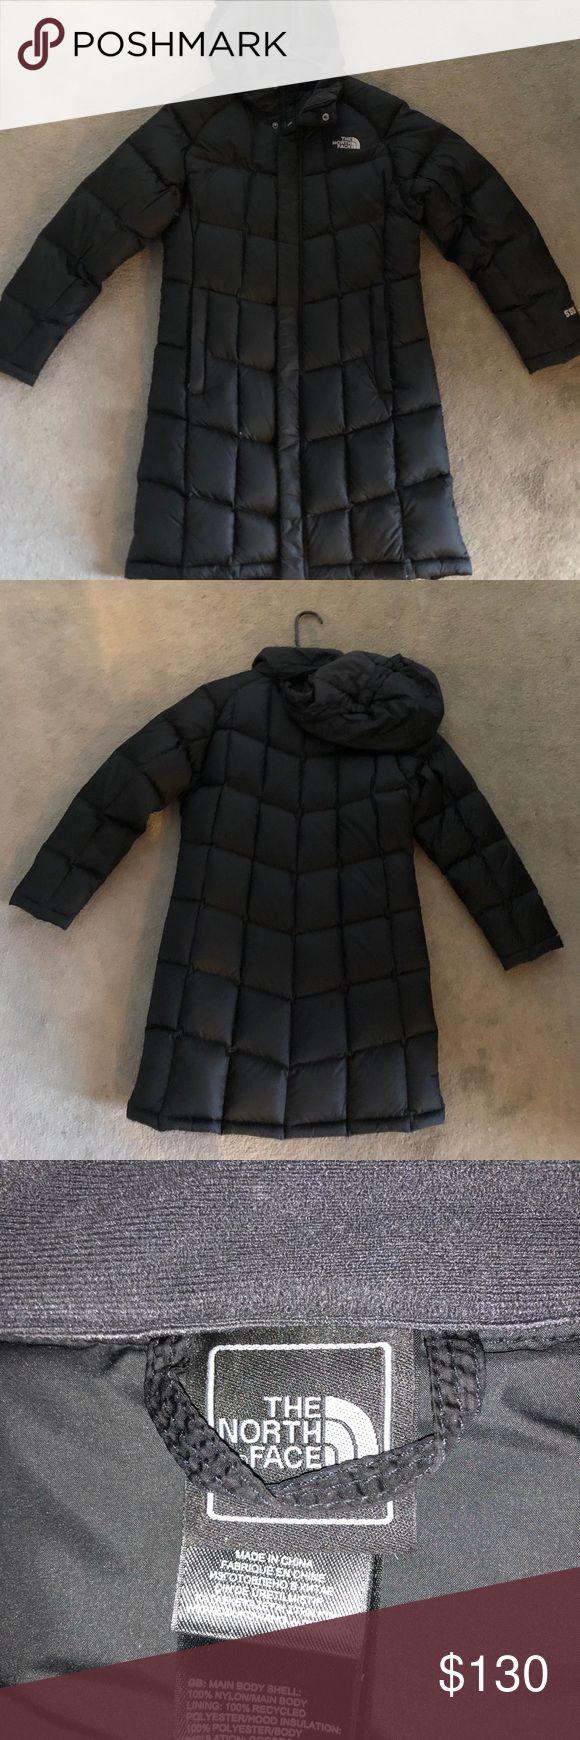 KIDS NORTH FACE PARKA BLACK WARM KIDS LARGE PARKA FOR SALE!!! The North Face Jackets & Coats